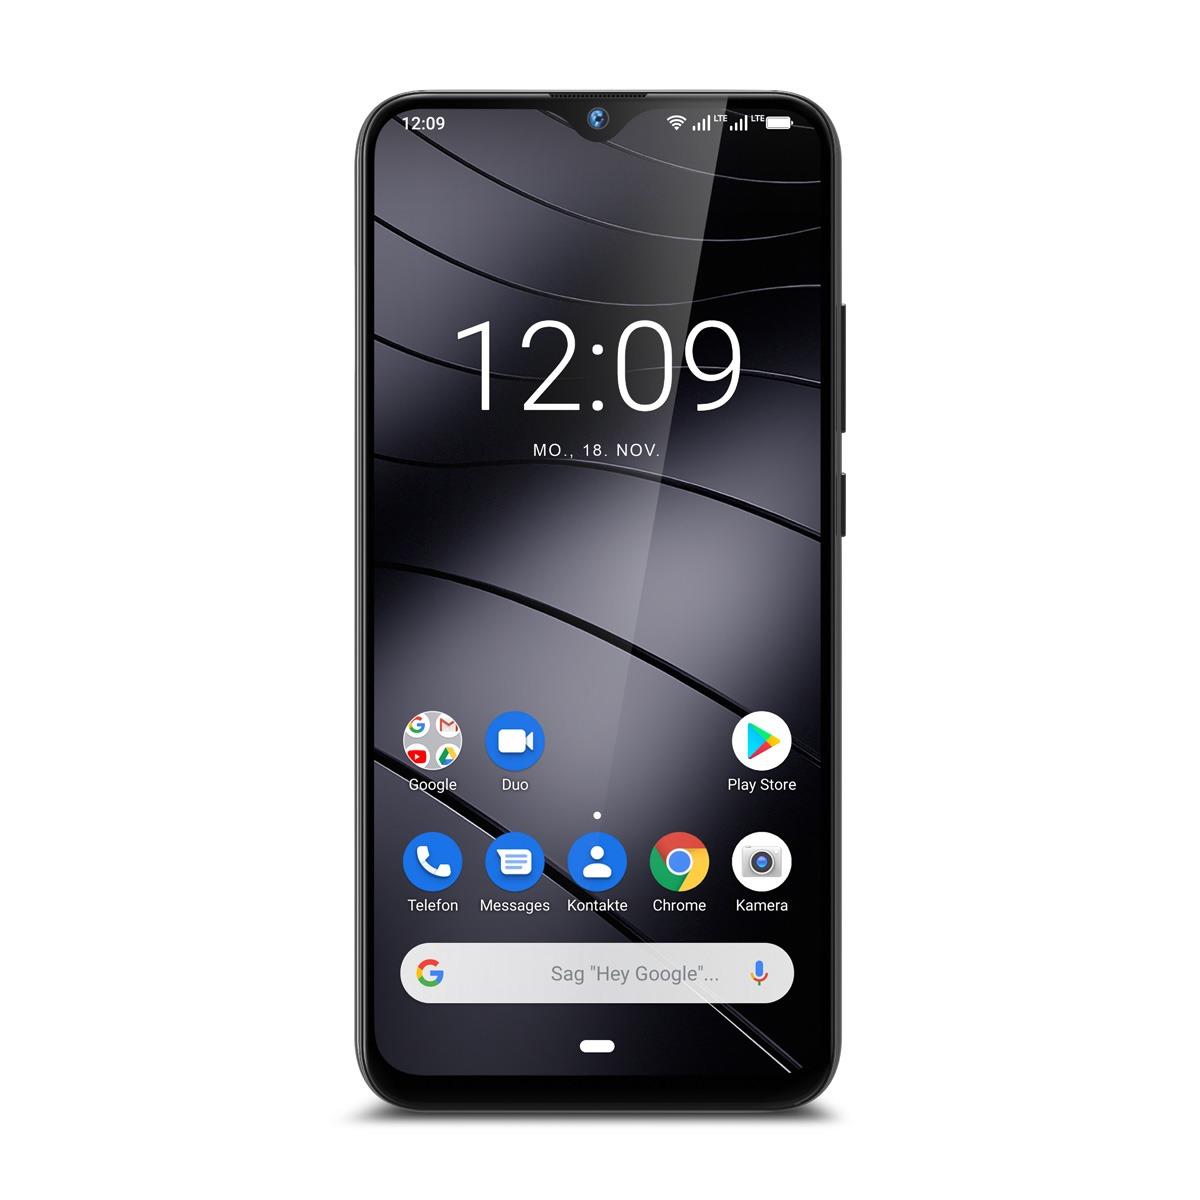 Gigaset smartphone GS290 BNL TITANIUM GREY grijs